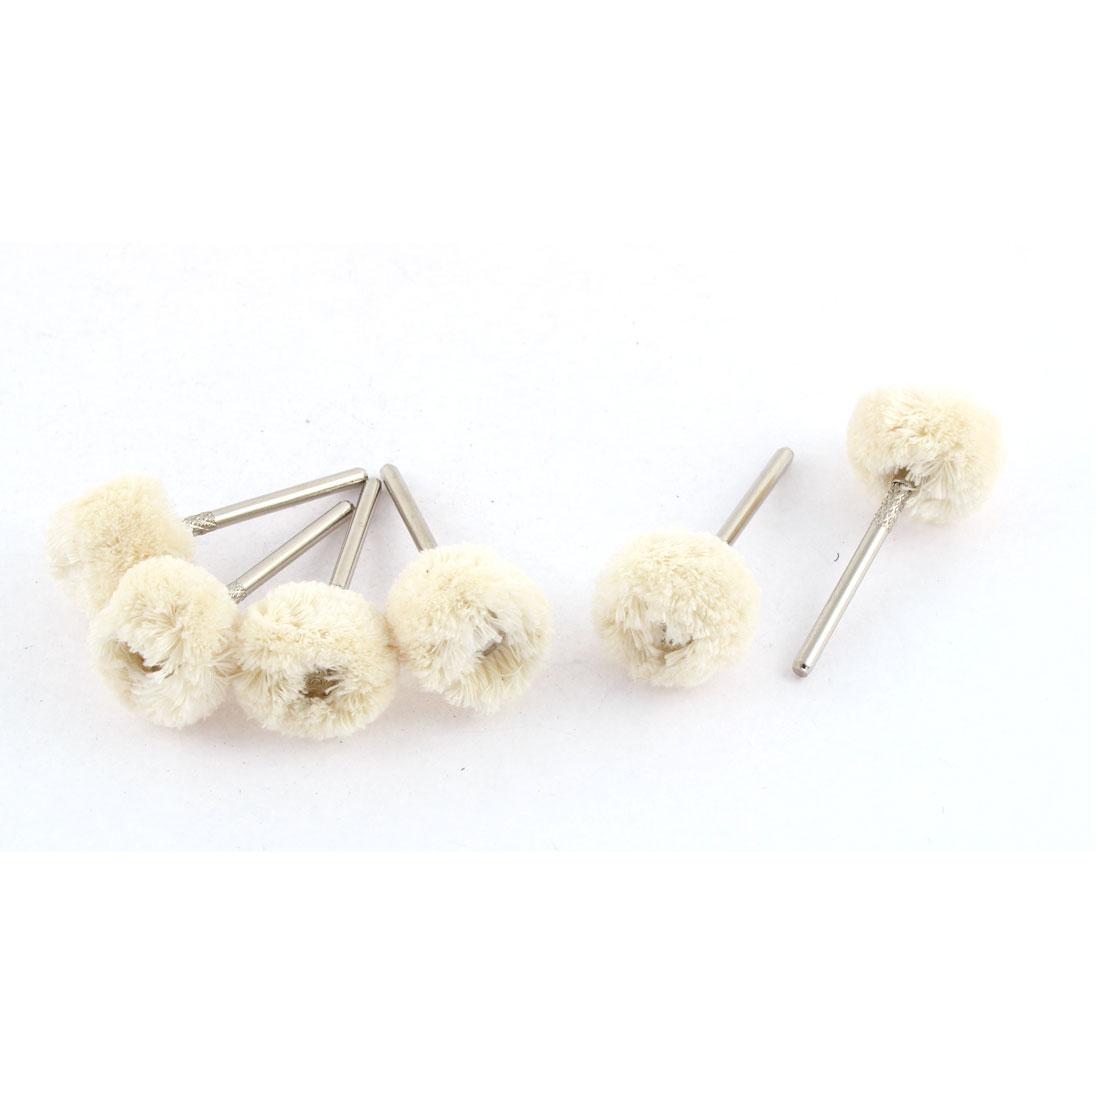 20mm Dia Soft Wool Rotary Tool Jewellery Buffing Polishing Wheel Brush 6pcs